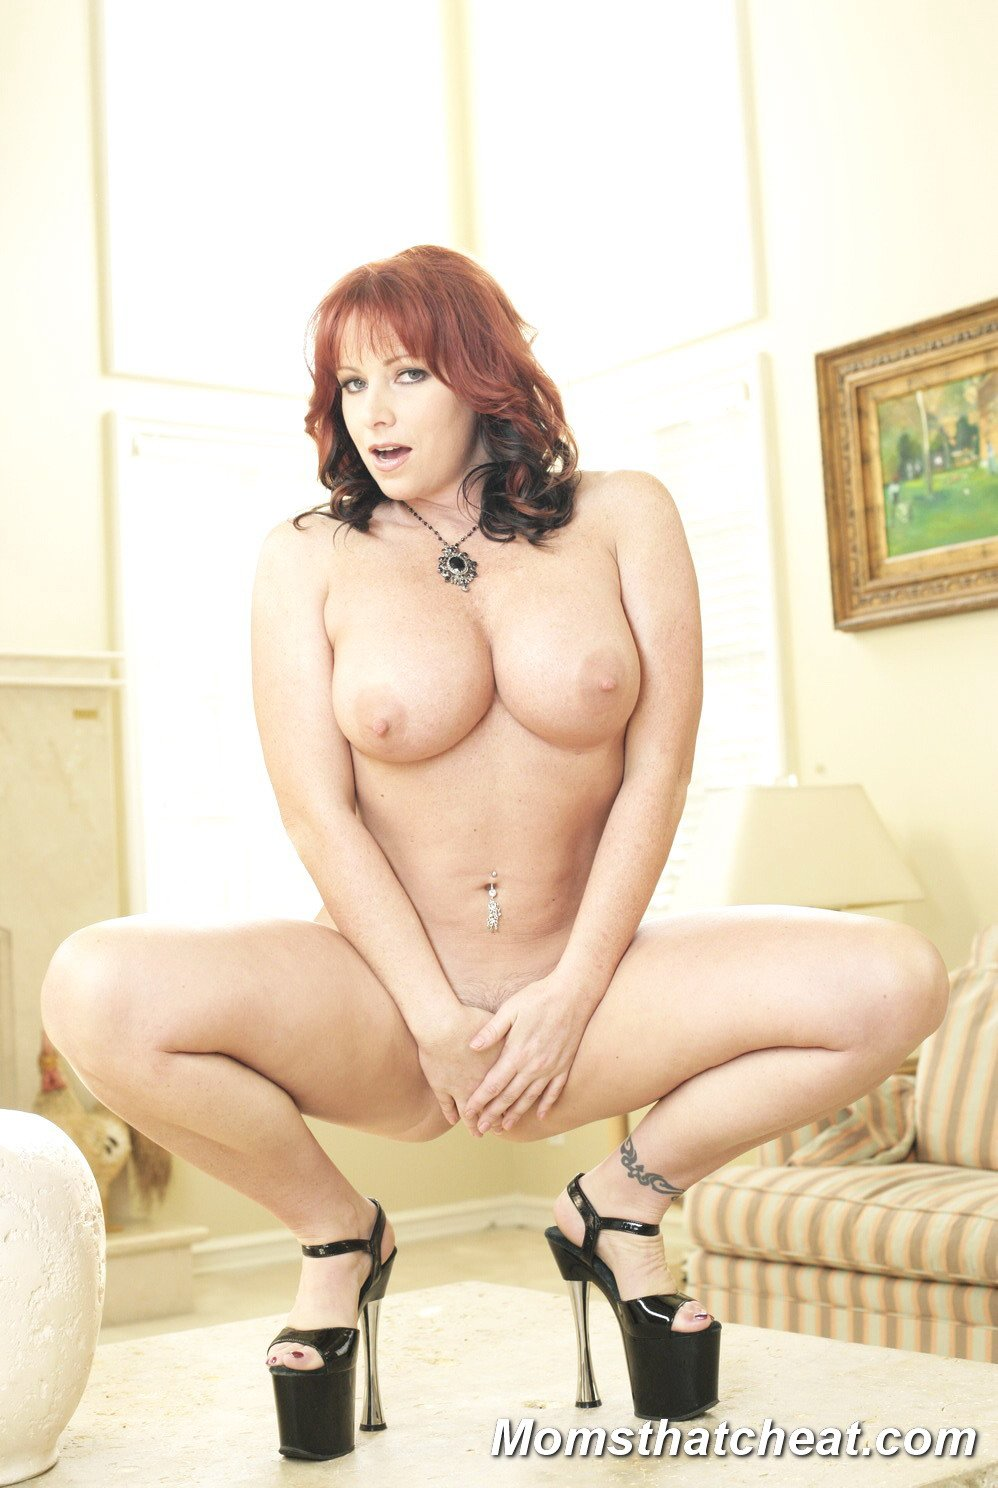 Milf Big Tits Redhead Gets Fucked